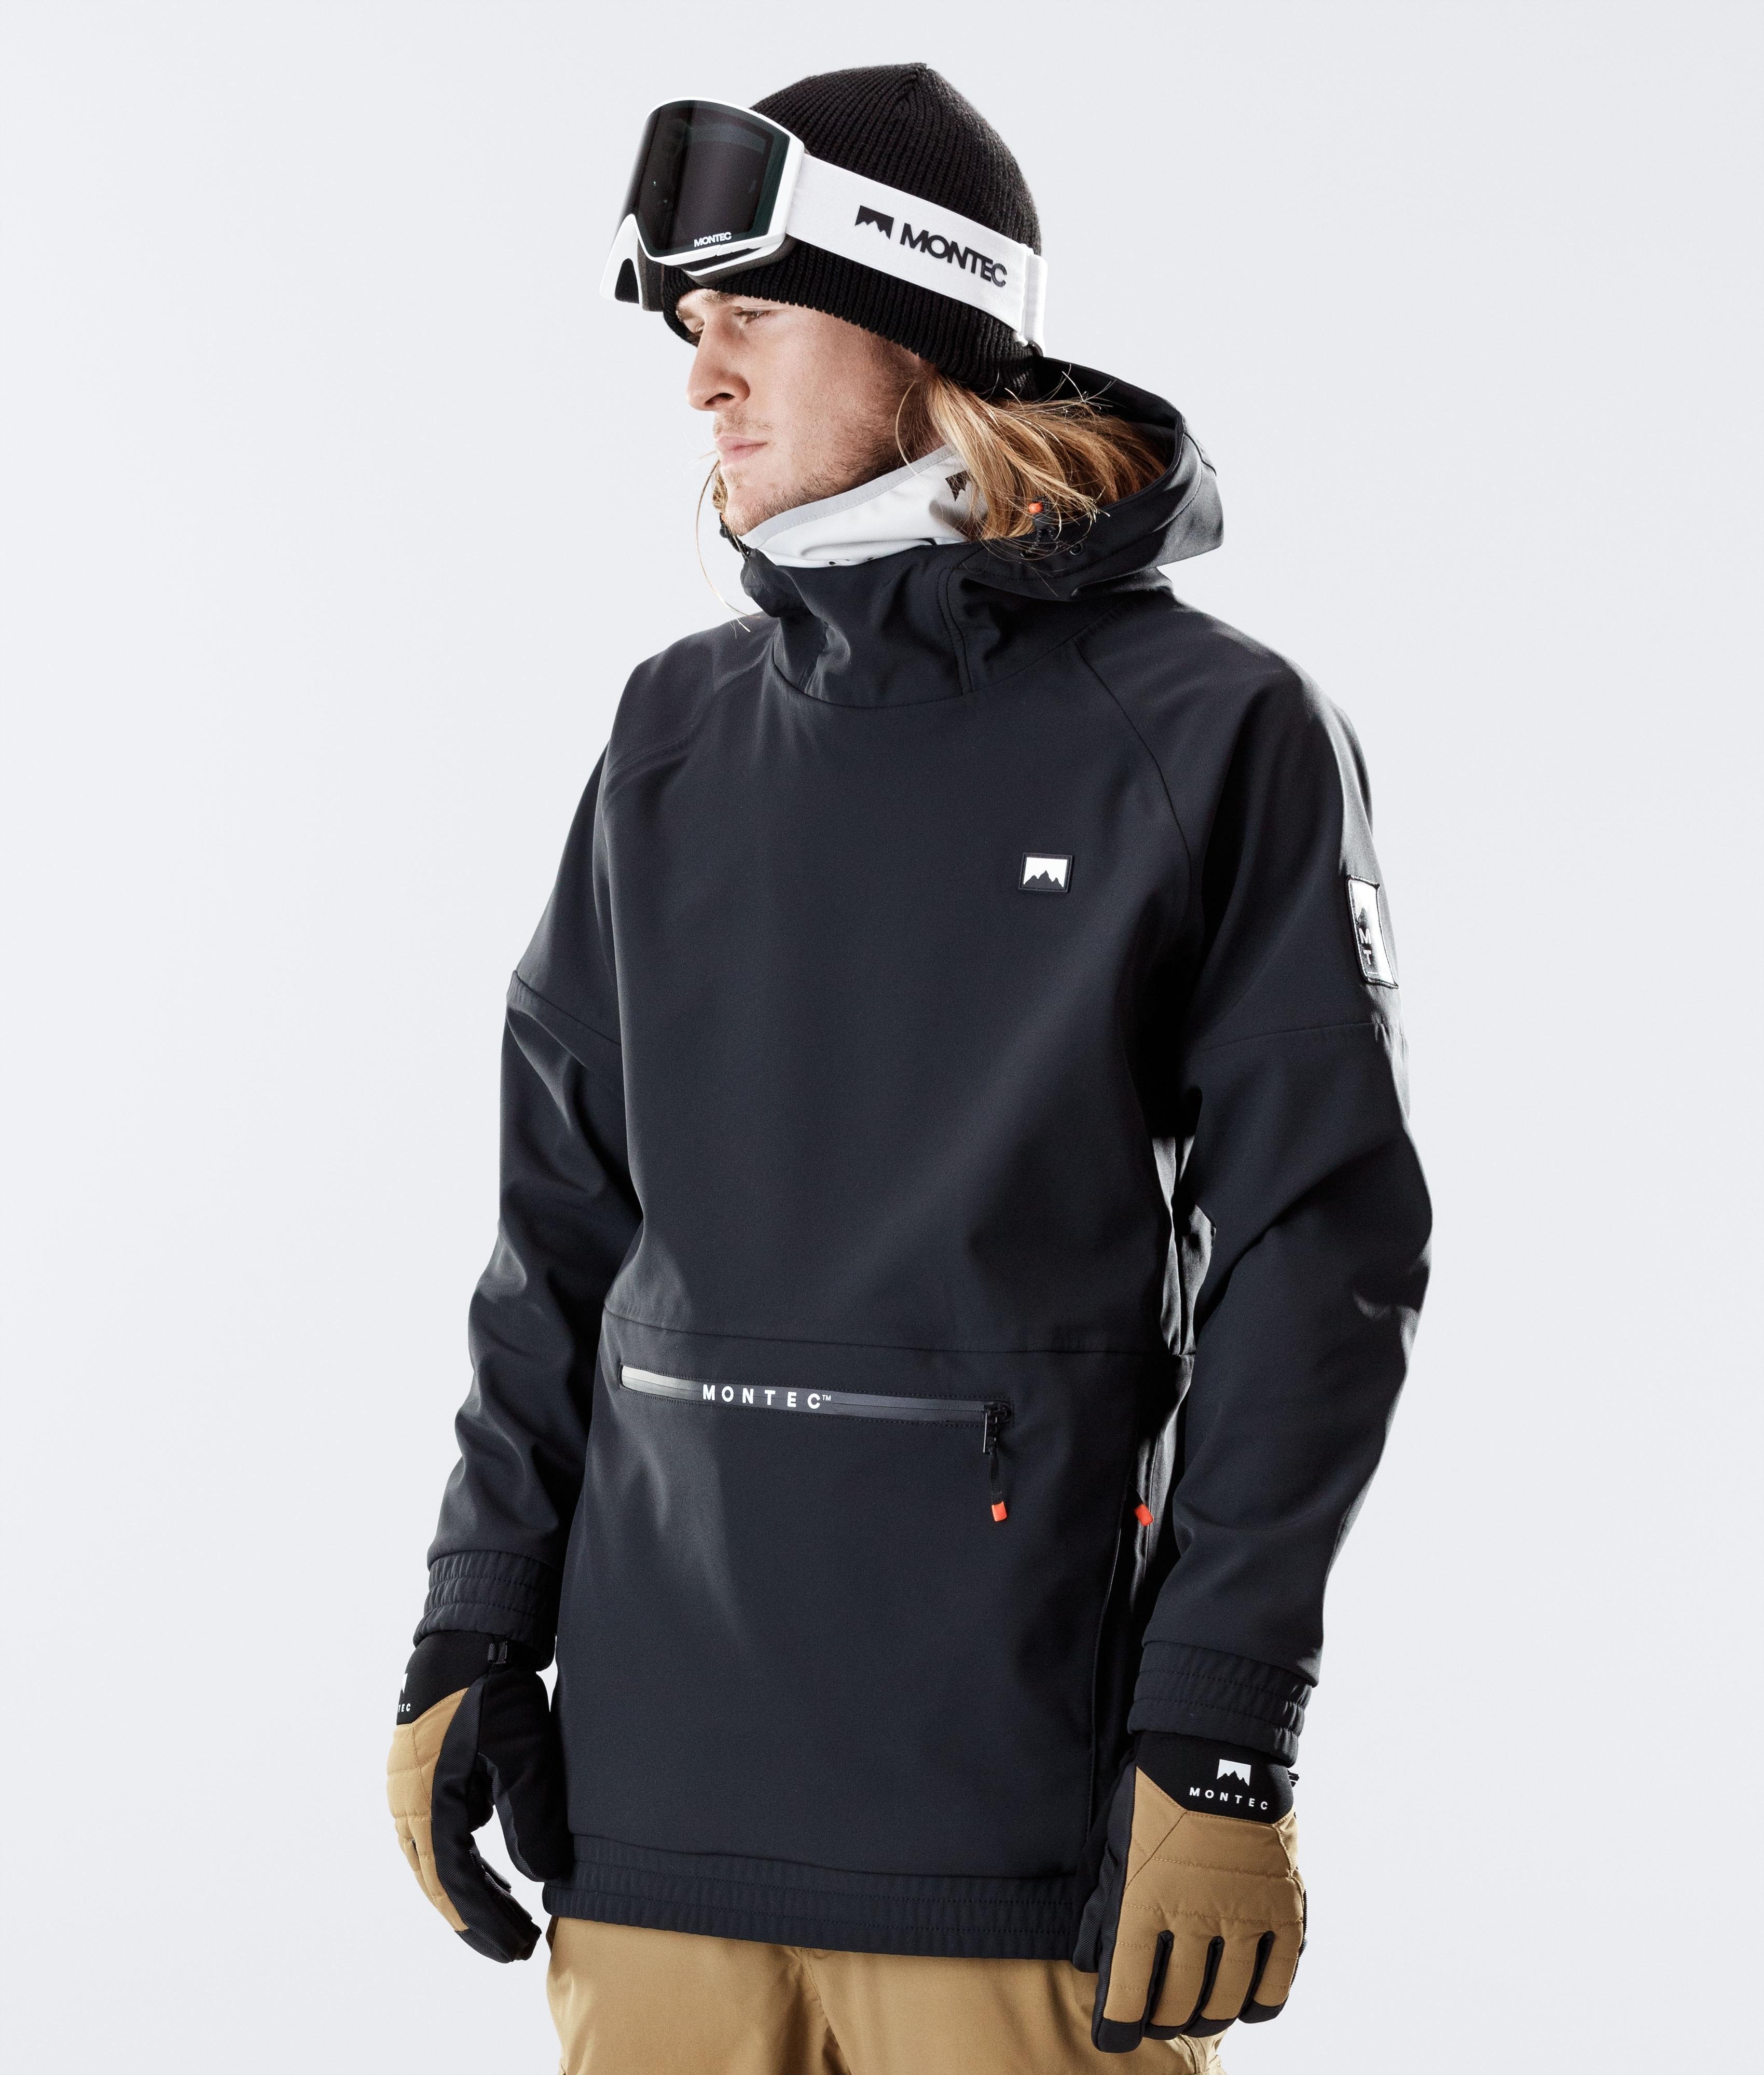 Avenmax Mens Ski Jacket Waterproof Windproof Rain Snow Jacket Hooded Ski Coat